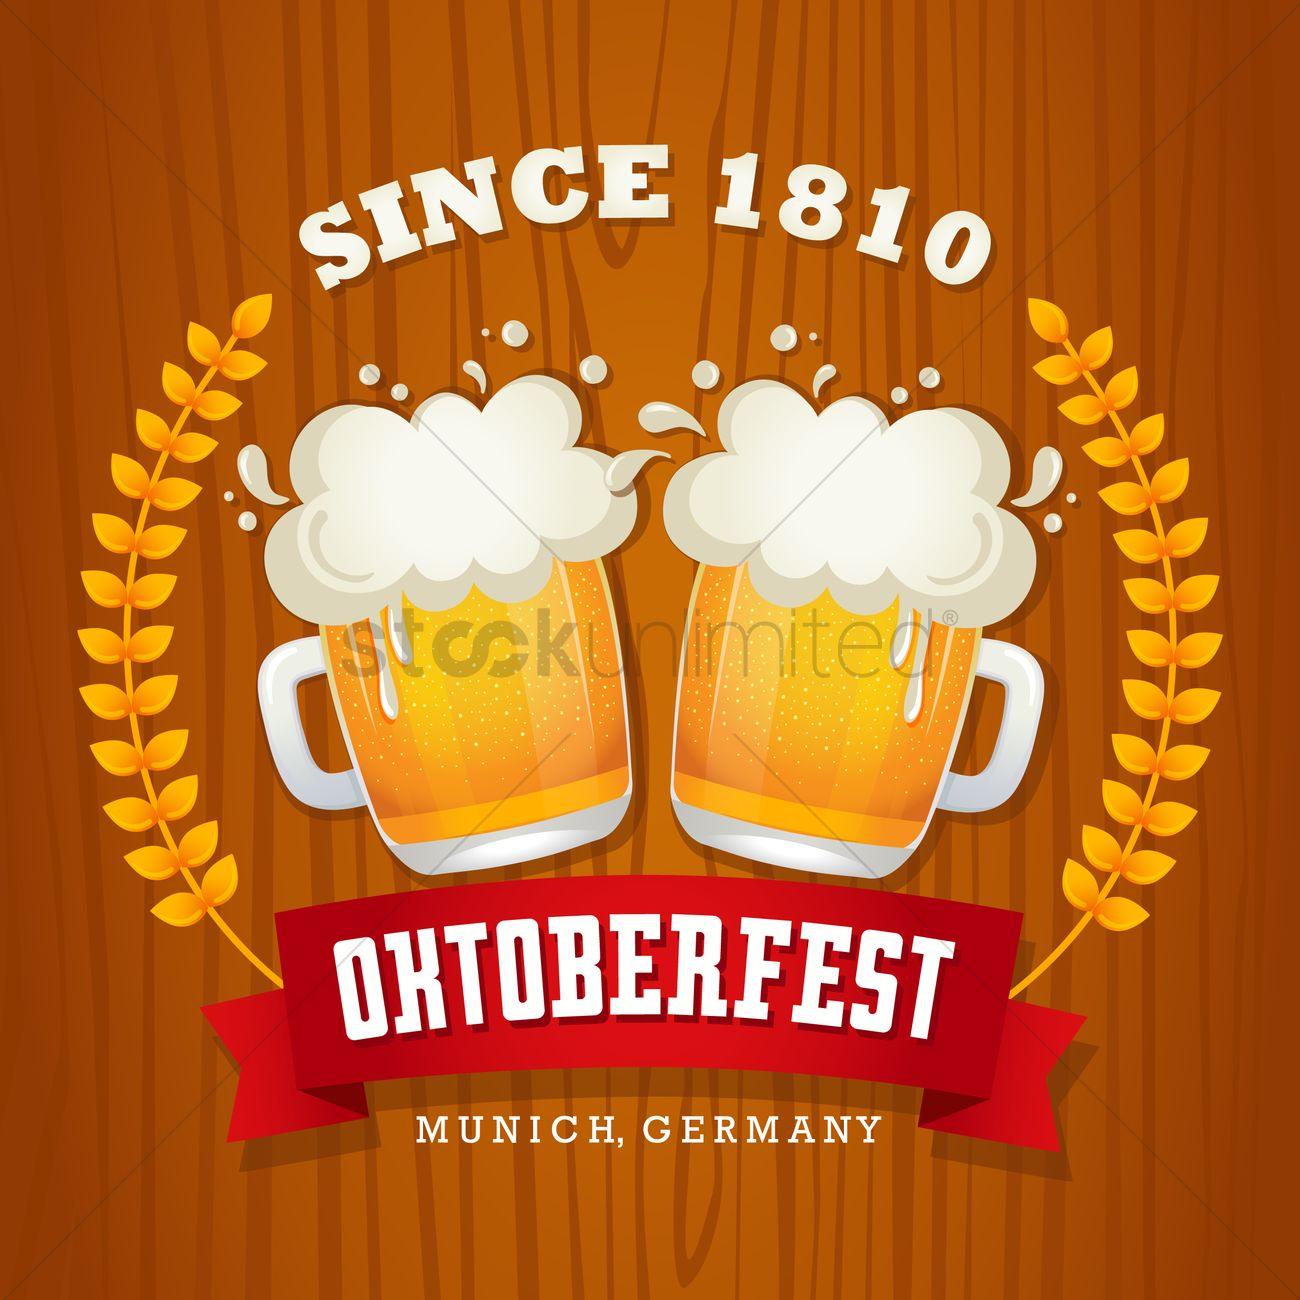 Oktoberfest wallpaper Vector Image   1480678 StockUnlimited 1300x1300